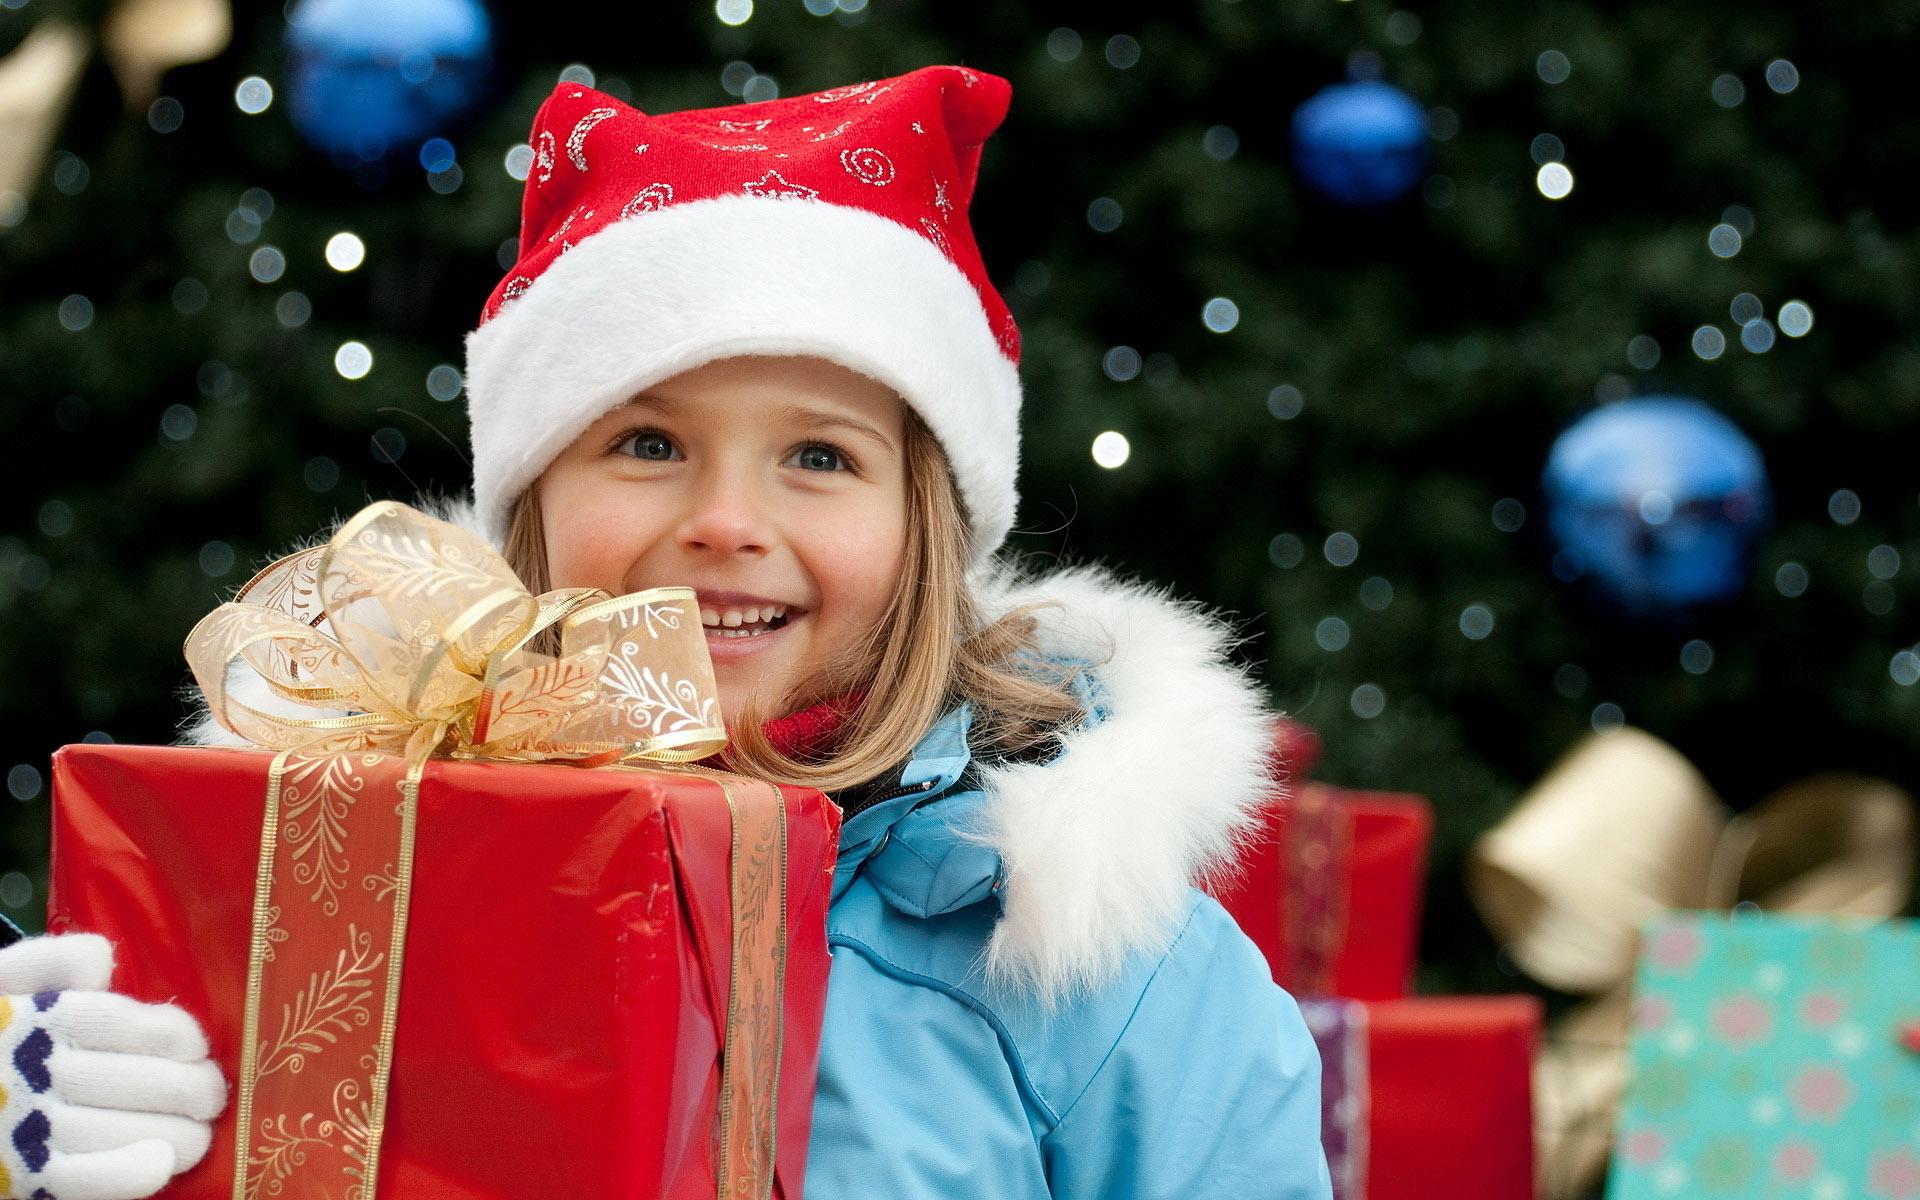 HDoboi.Kiev.ua - Девочка с подарком на фоне елки, обои на телефон зима новый год